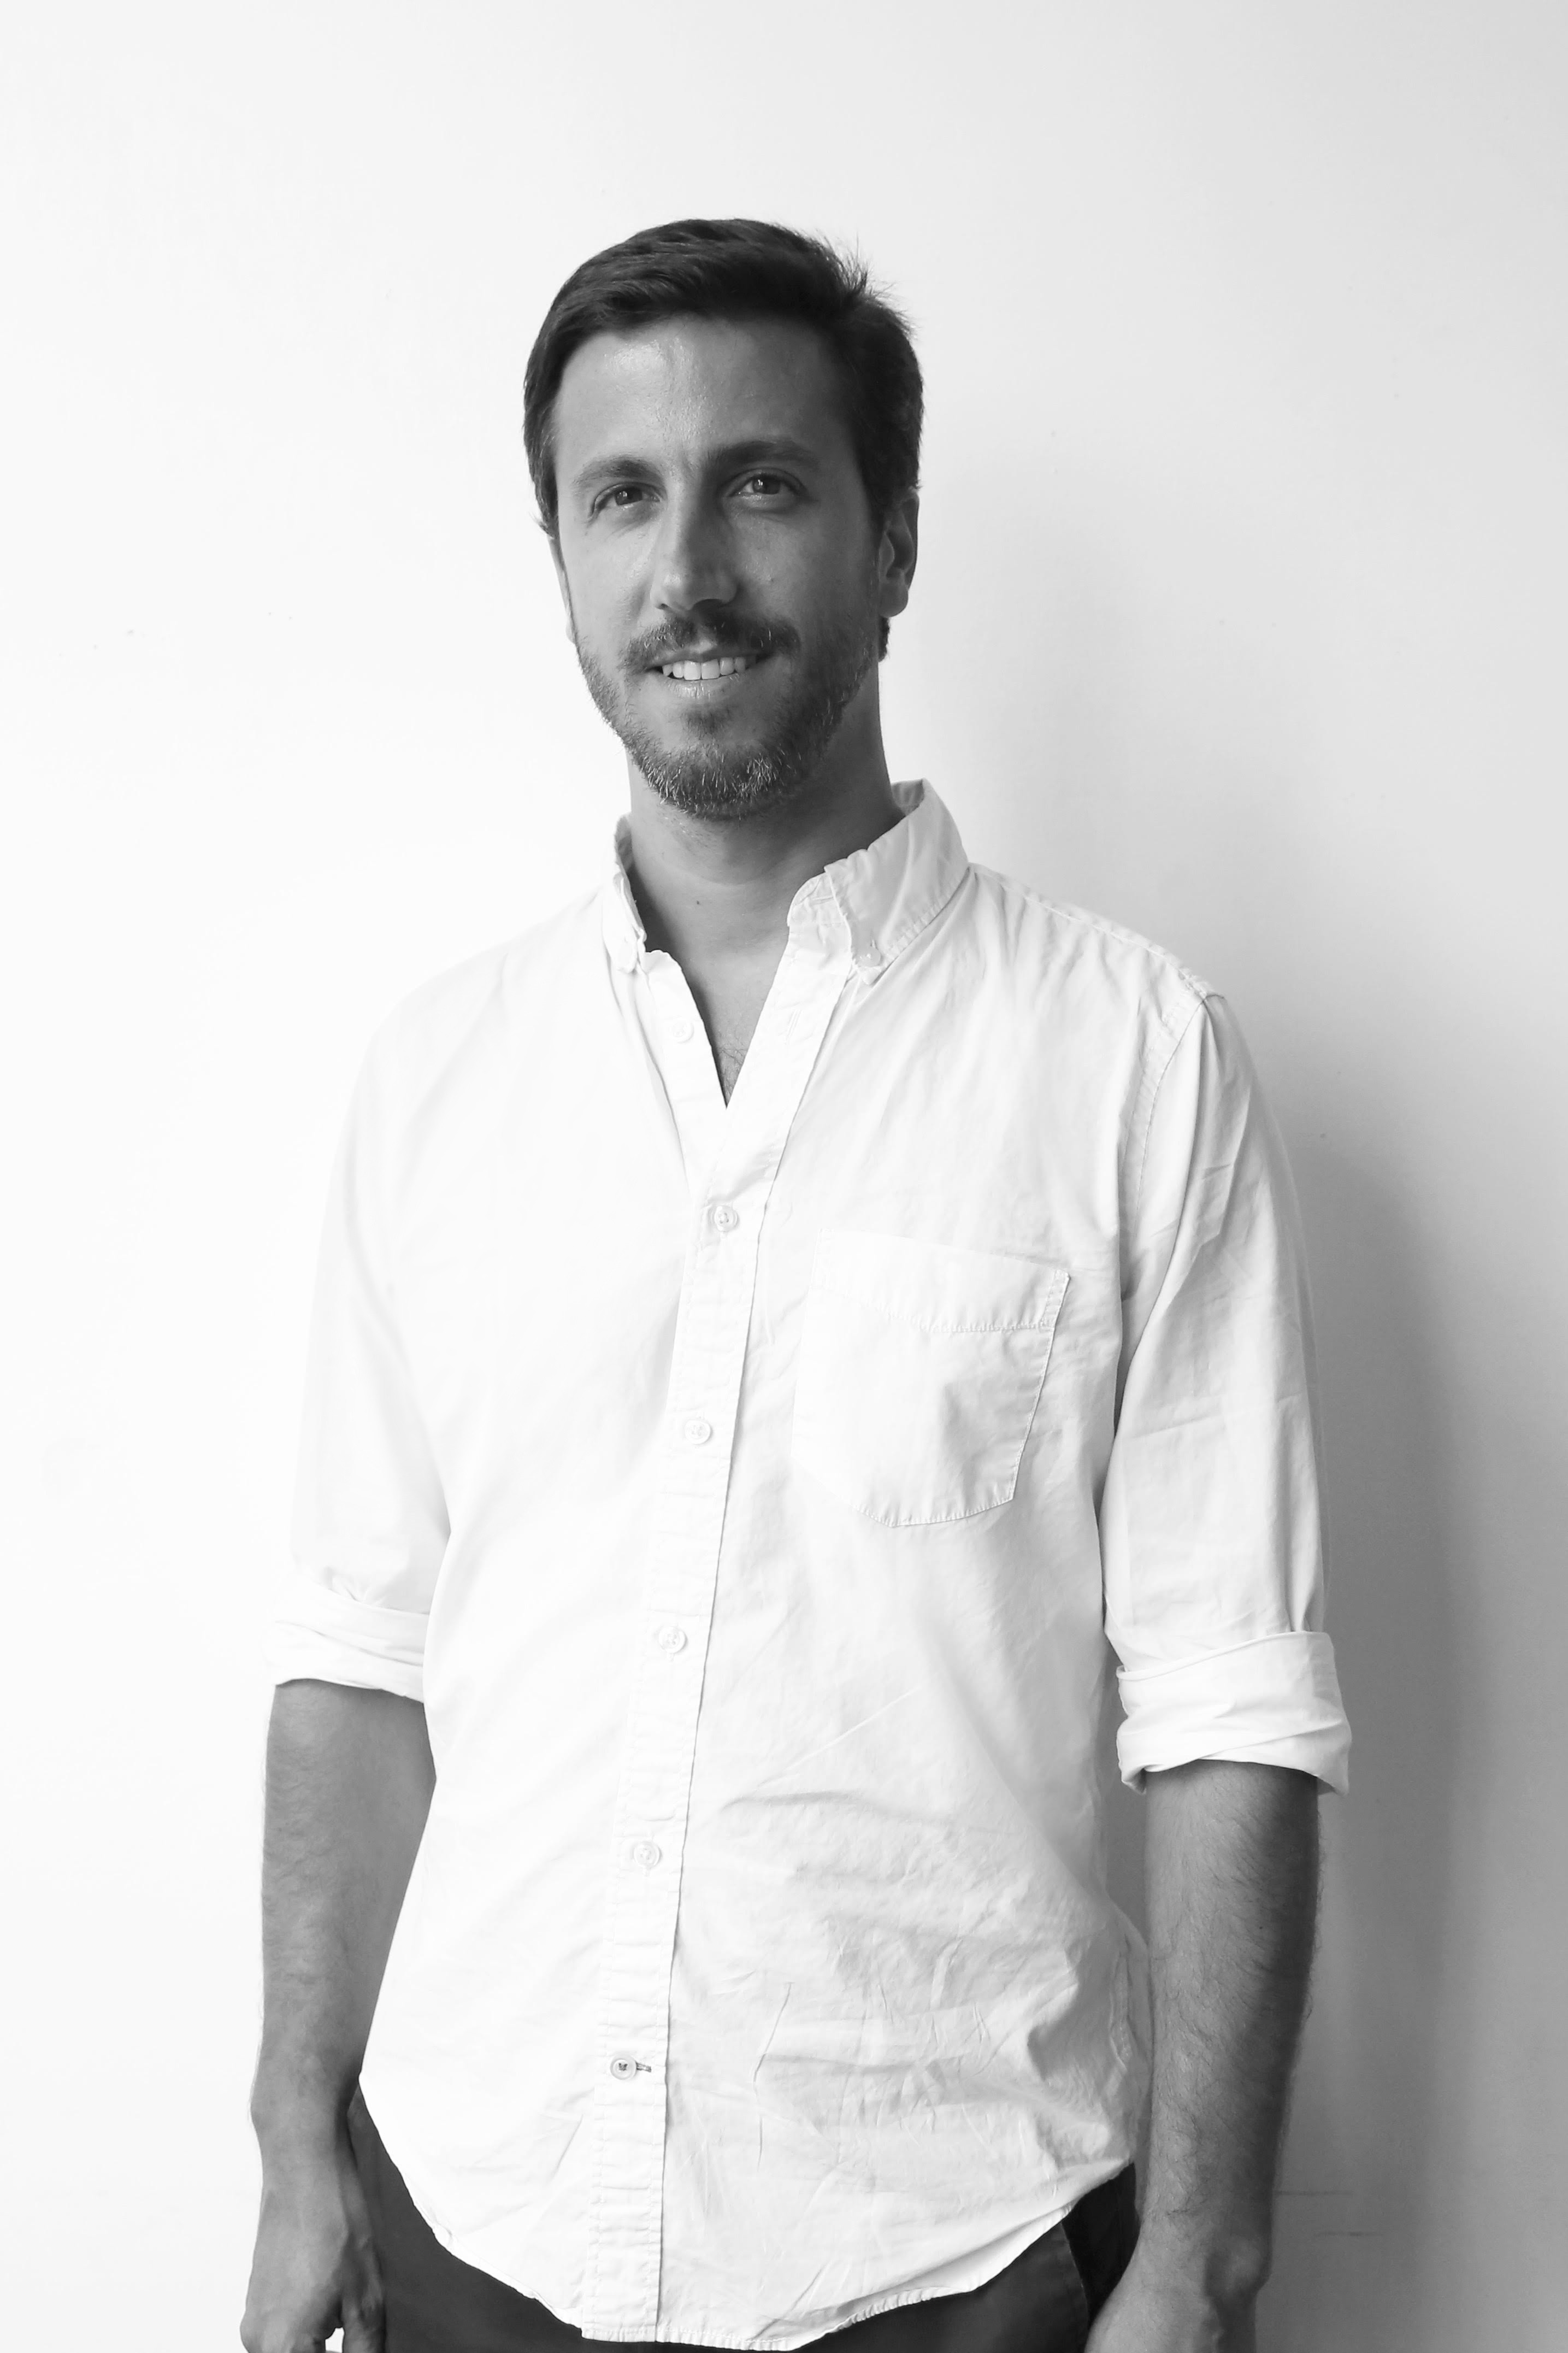 Filipe Taboada